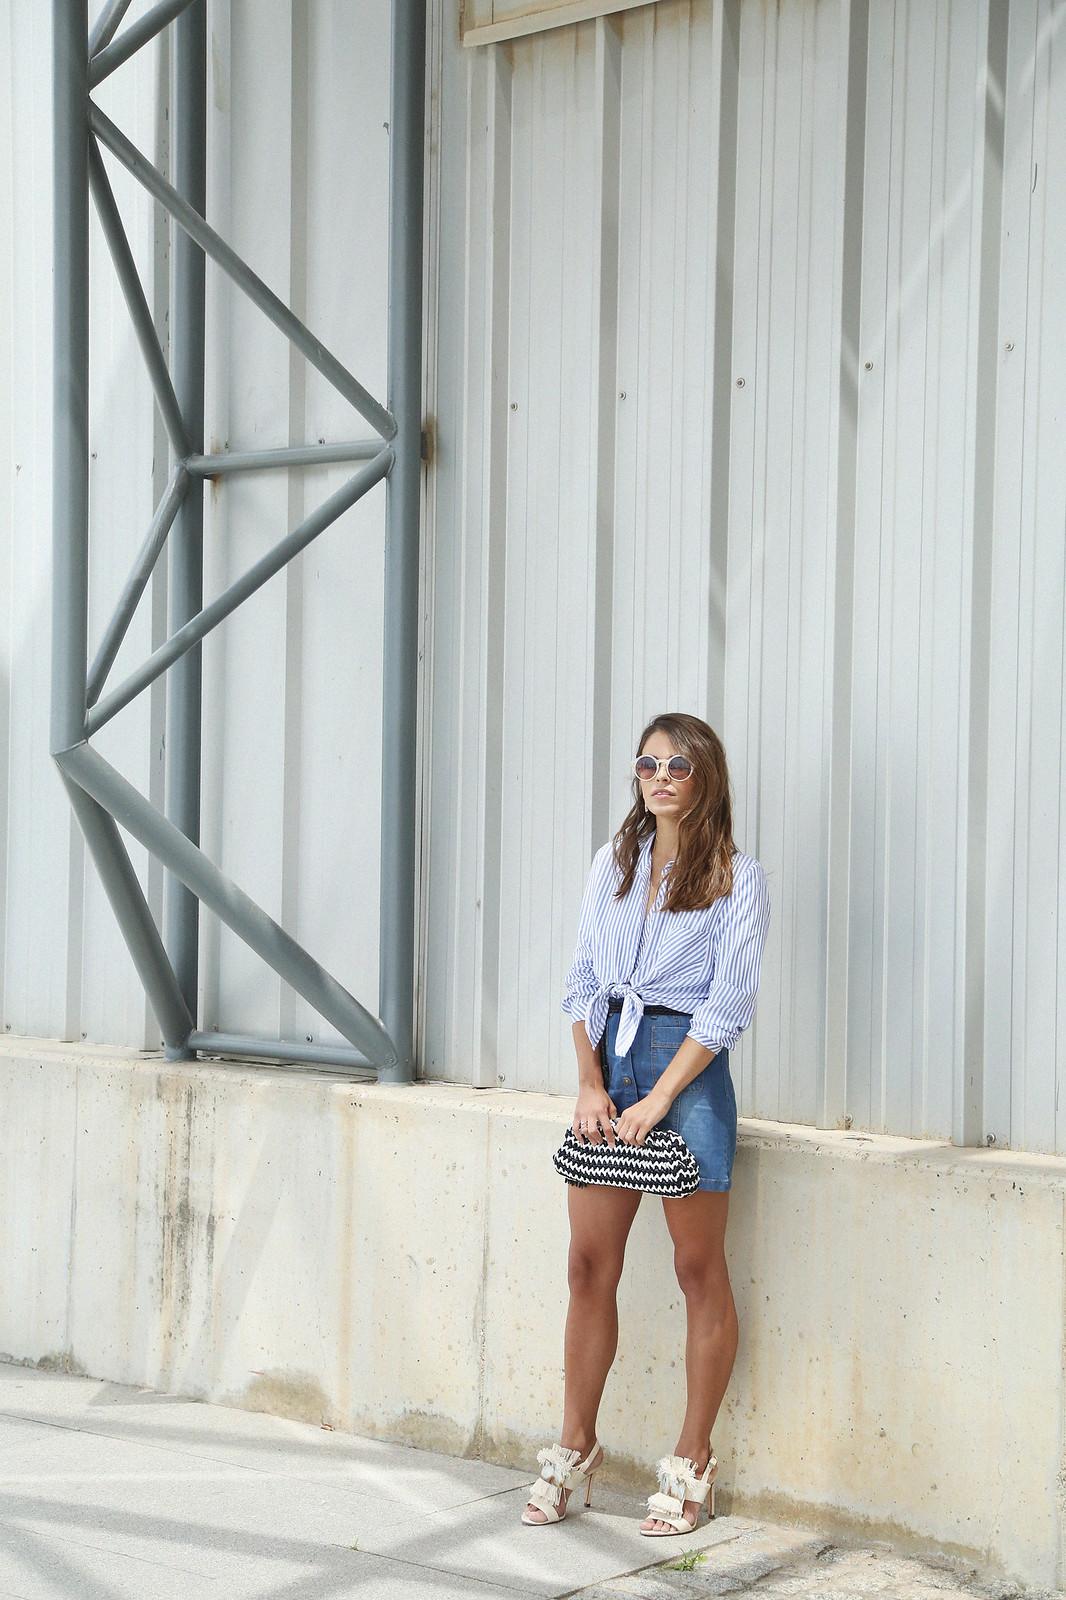 jessie chanes seams for a desire denim skirt stripes shirt-7